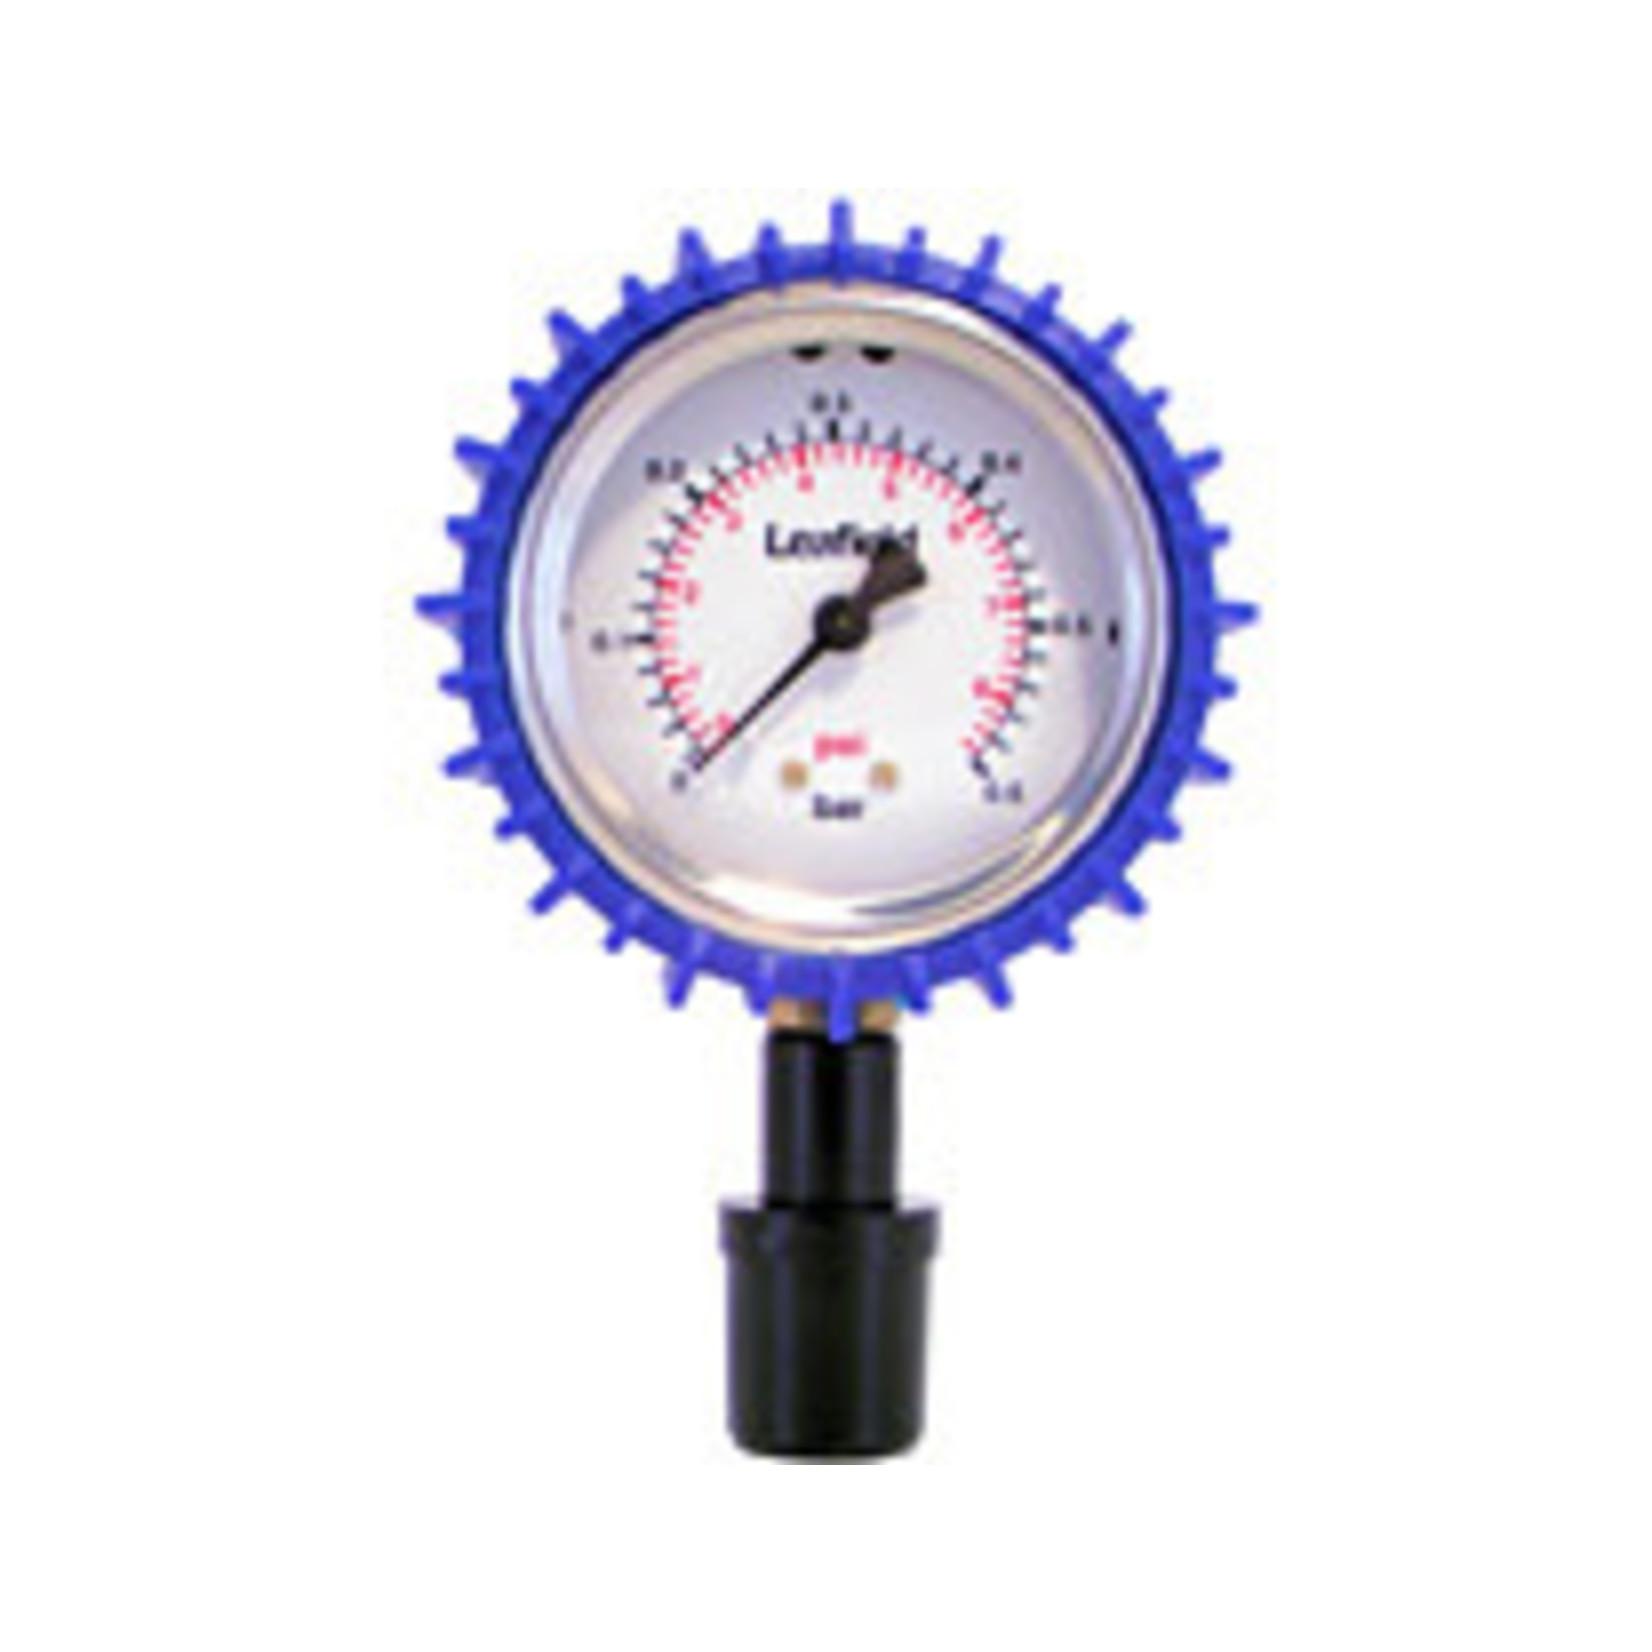 Leafield Pressure Gauge (SUP) - C7, D7 and B7